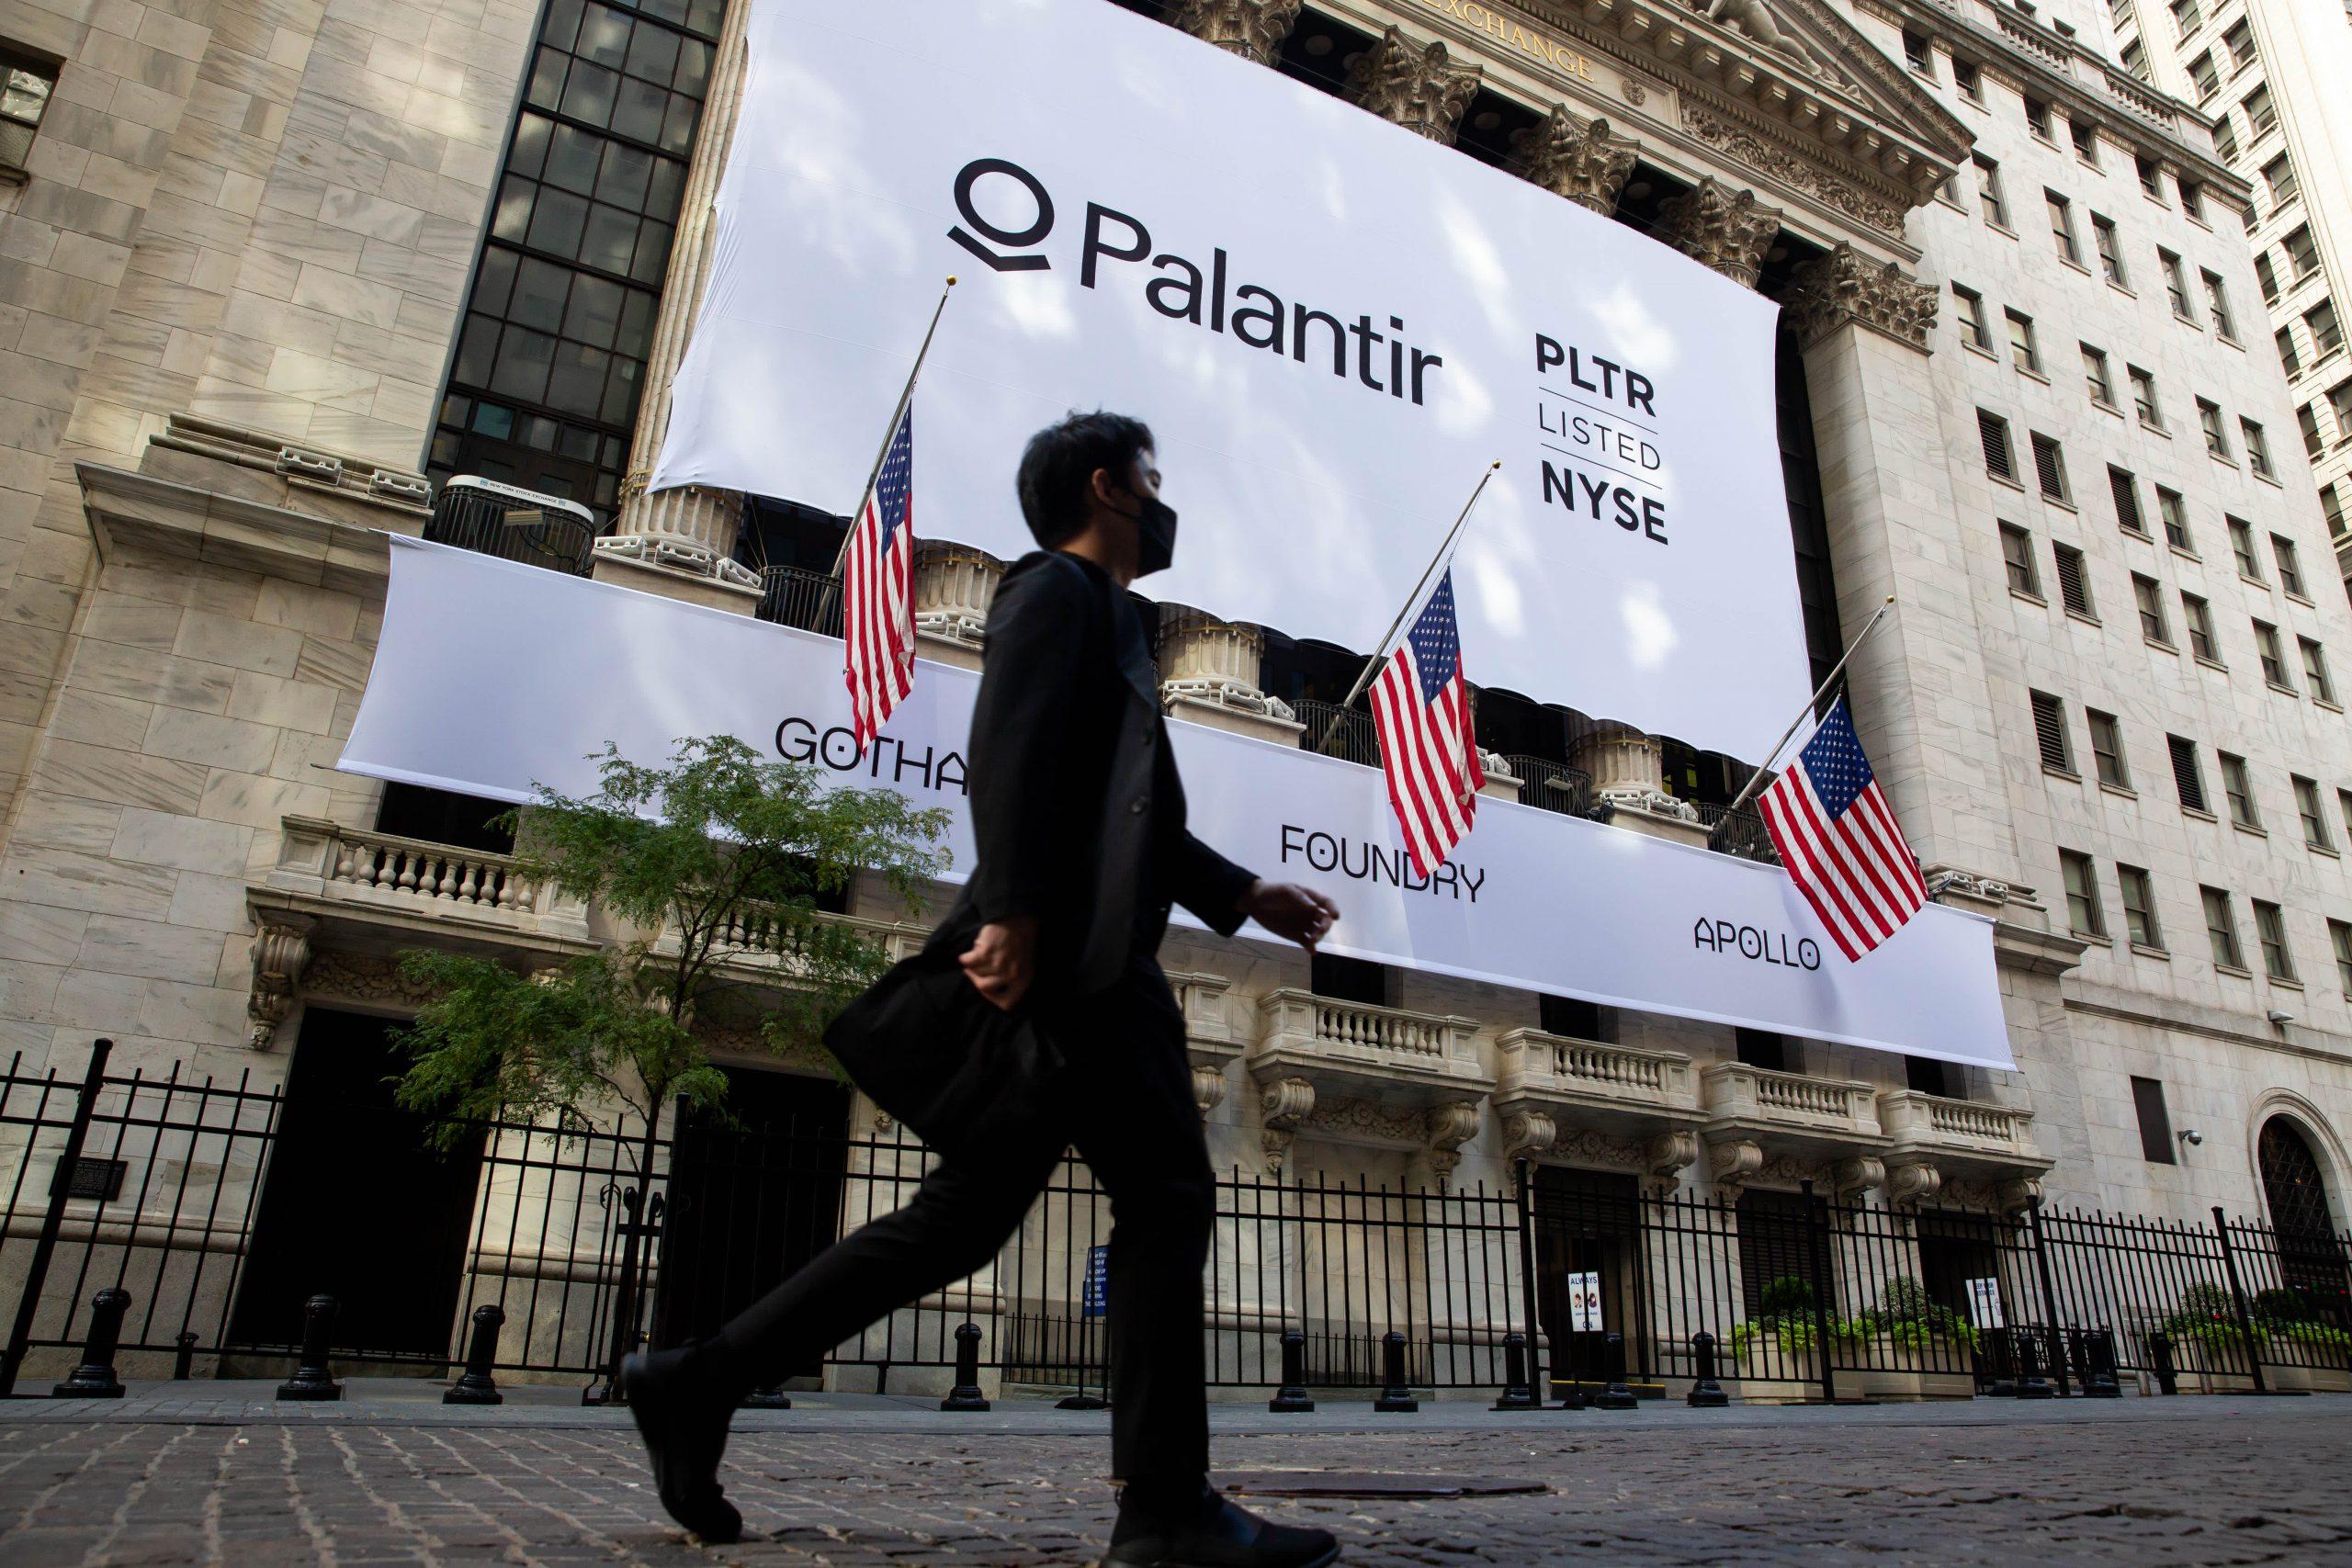 Palantir hires former IBM Watson Health exec